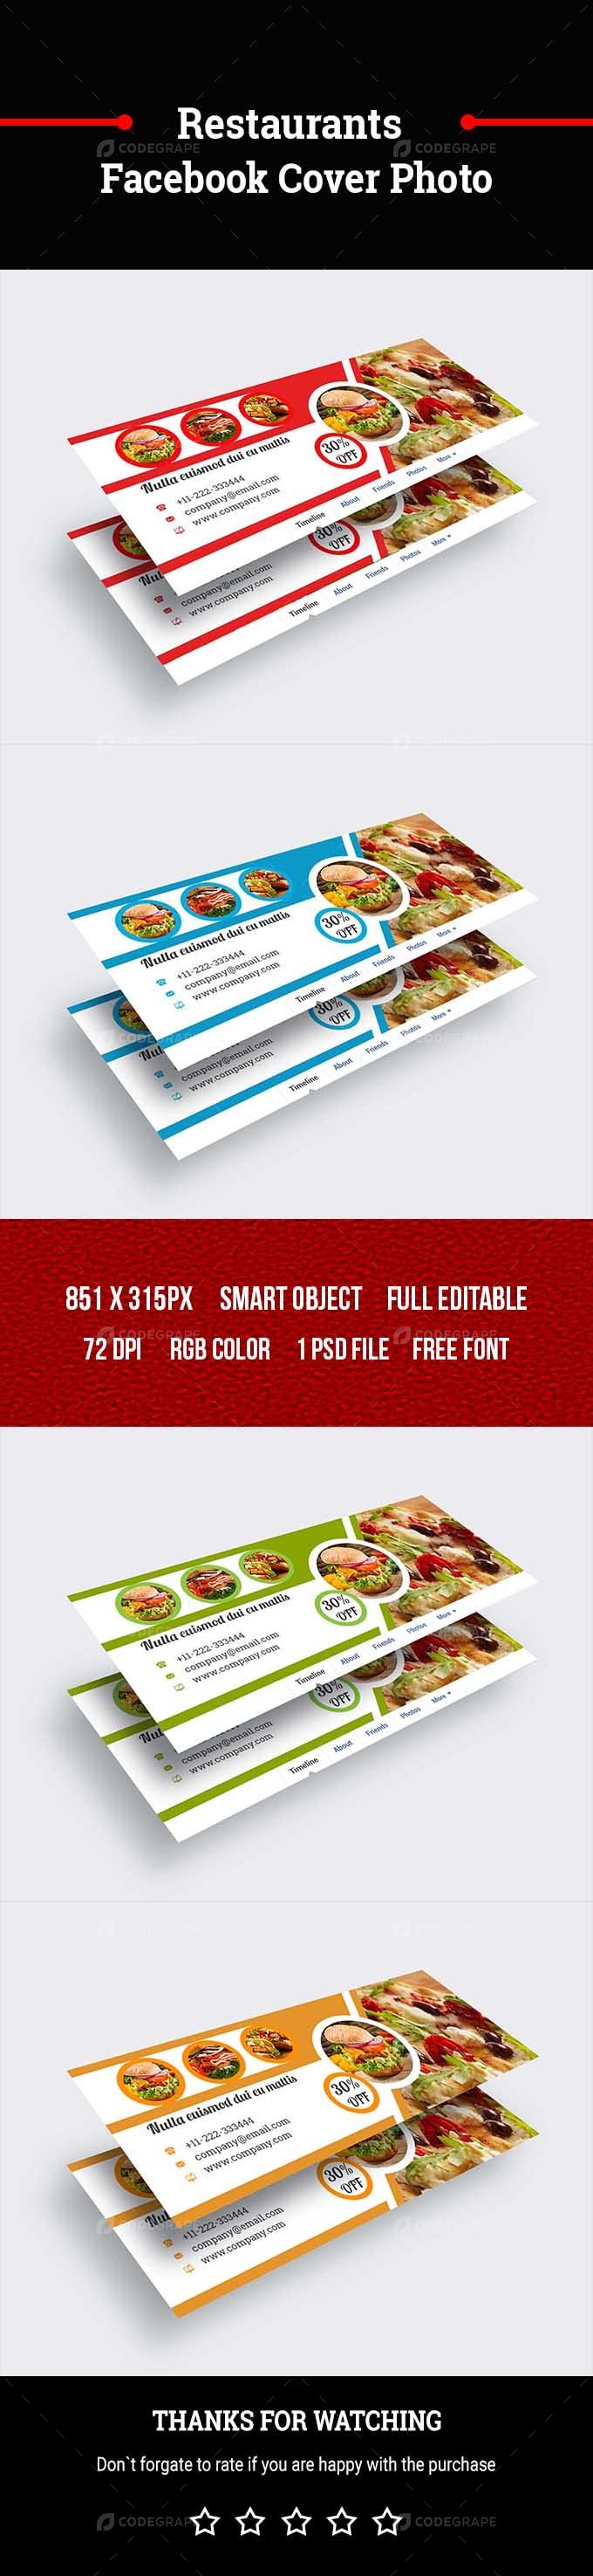 Restaurants Facebook Cover